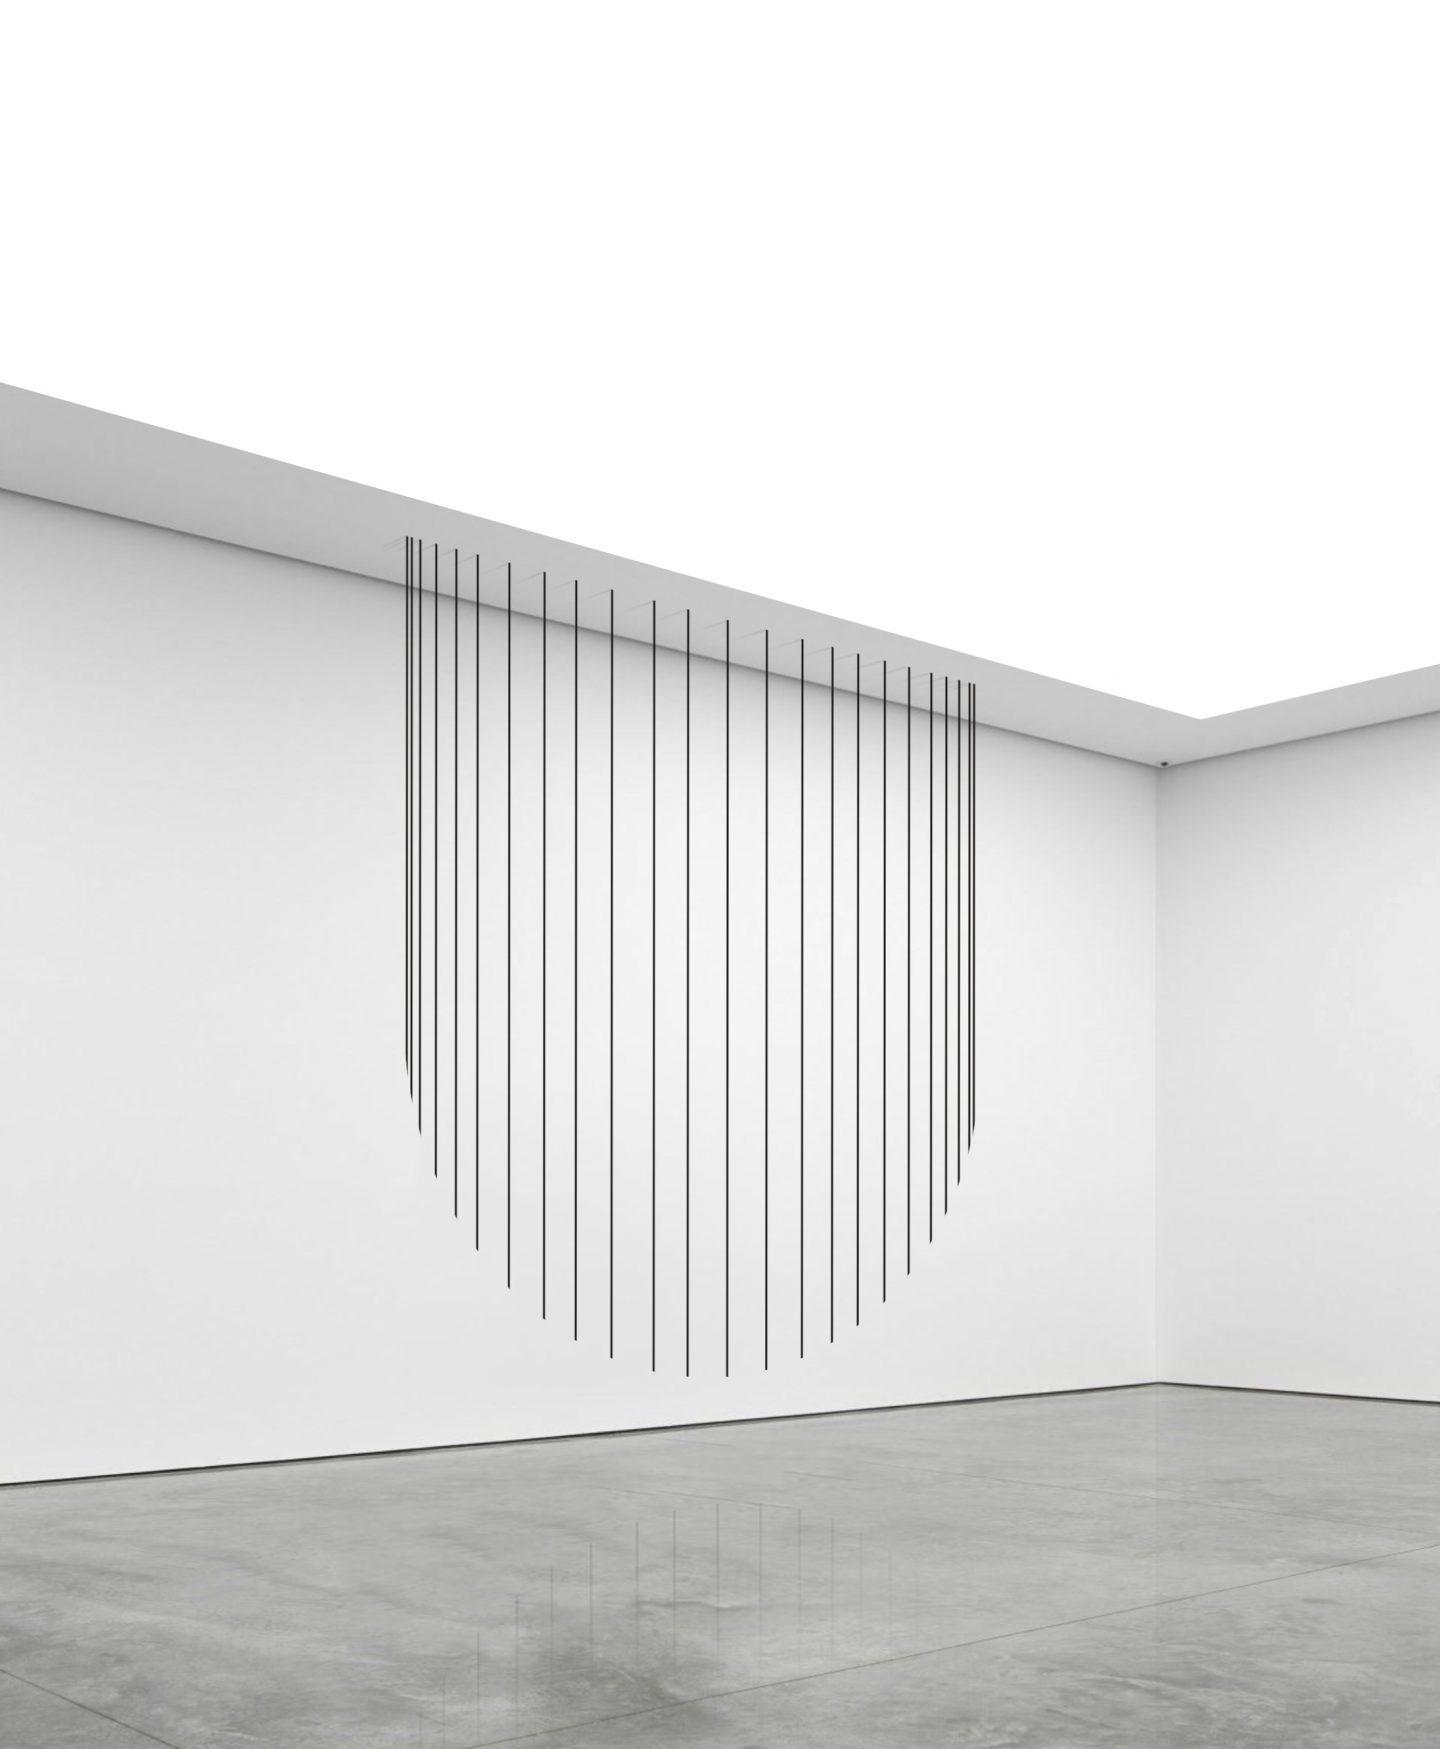 IGNANT-Art-Mikael-Strobek-014